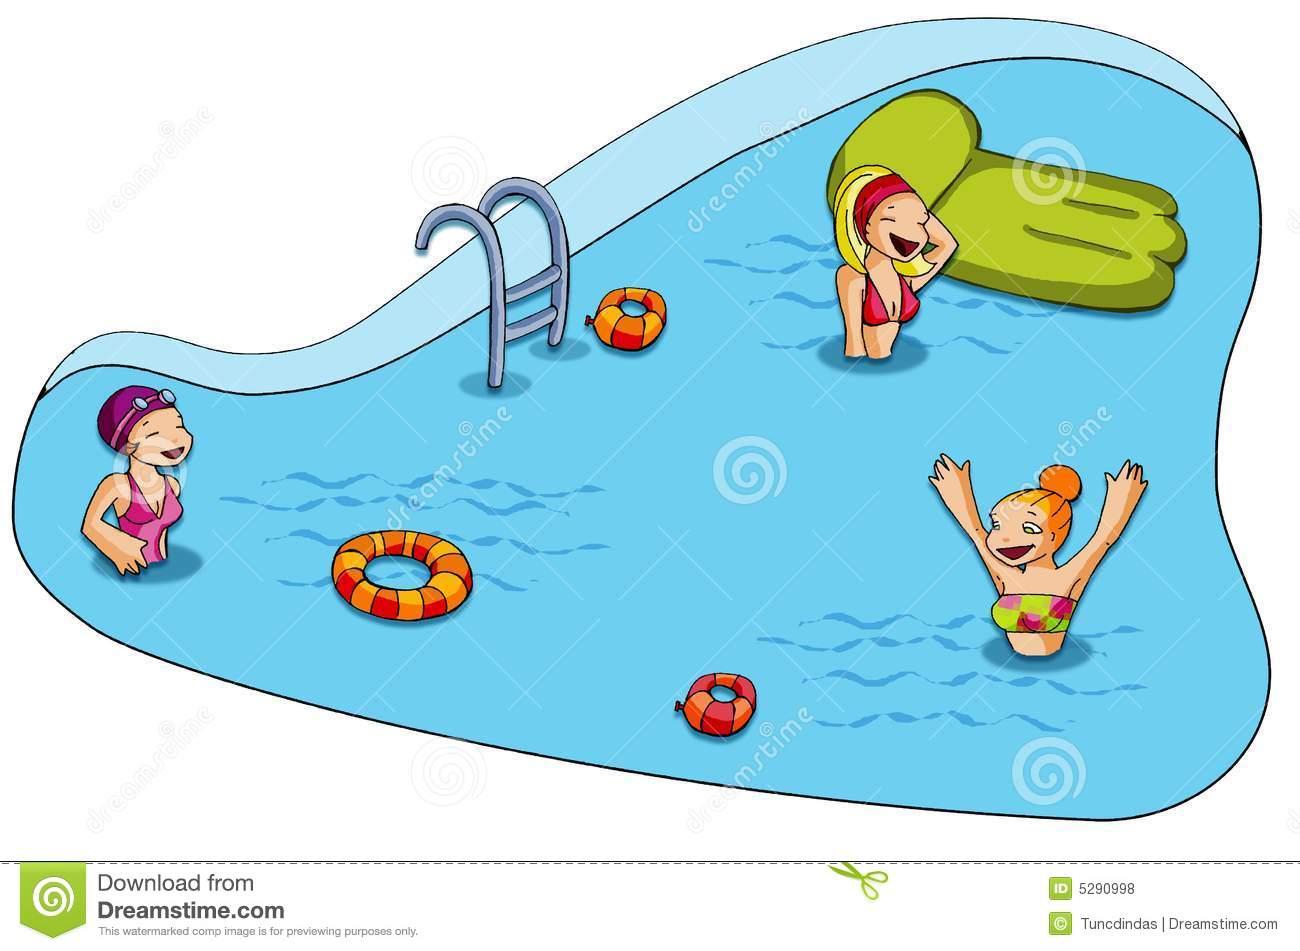 Swimming Pool Royalty Free Stock Photos -Swimming Pool Royalty Free Stock Photos Image 5290998-3